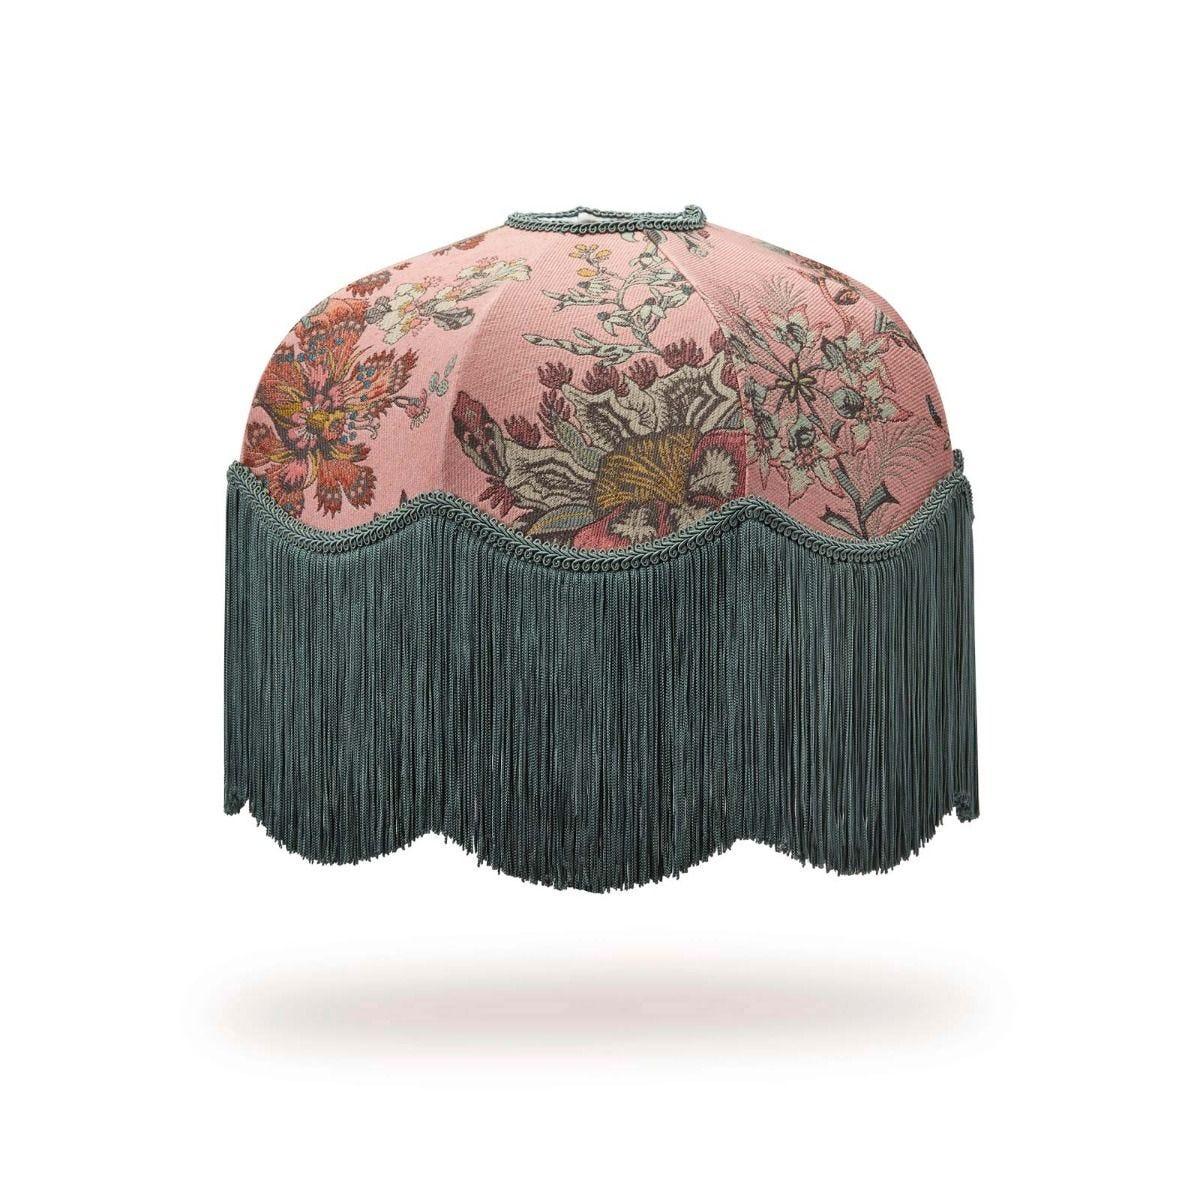 Florafantasia Tilia Lampeskjerm Bisque Pink